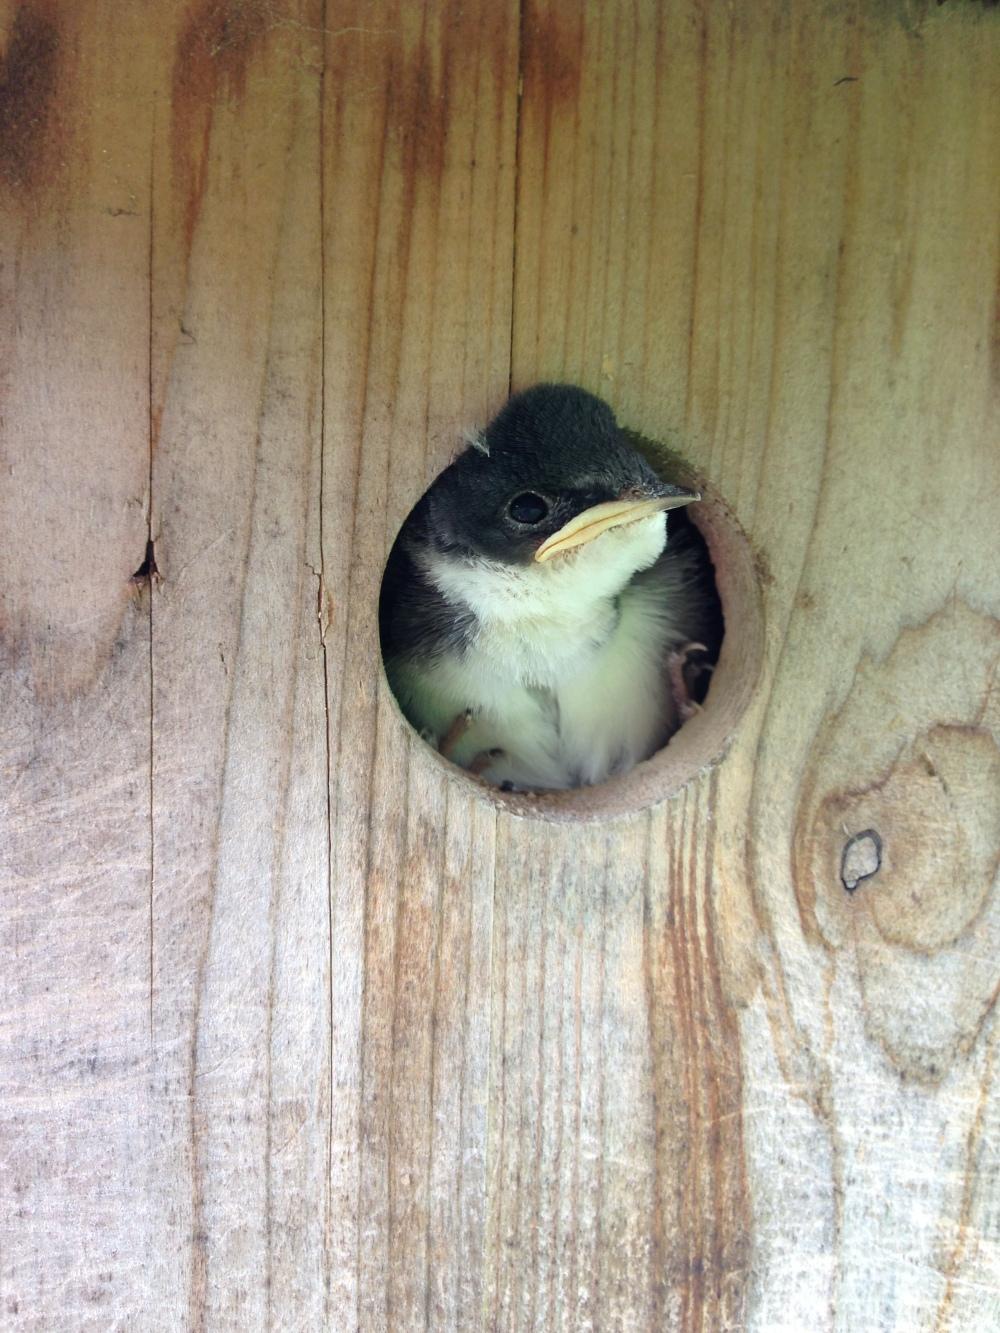 Tree swallow chick.  Photo by Blake Goll